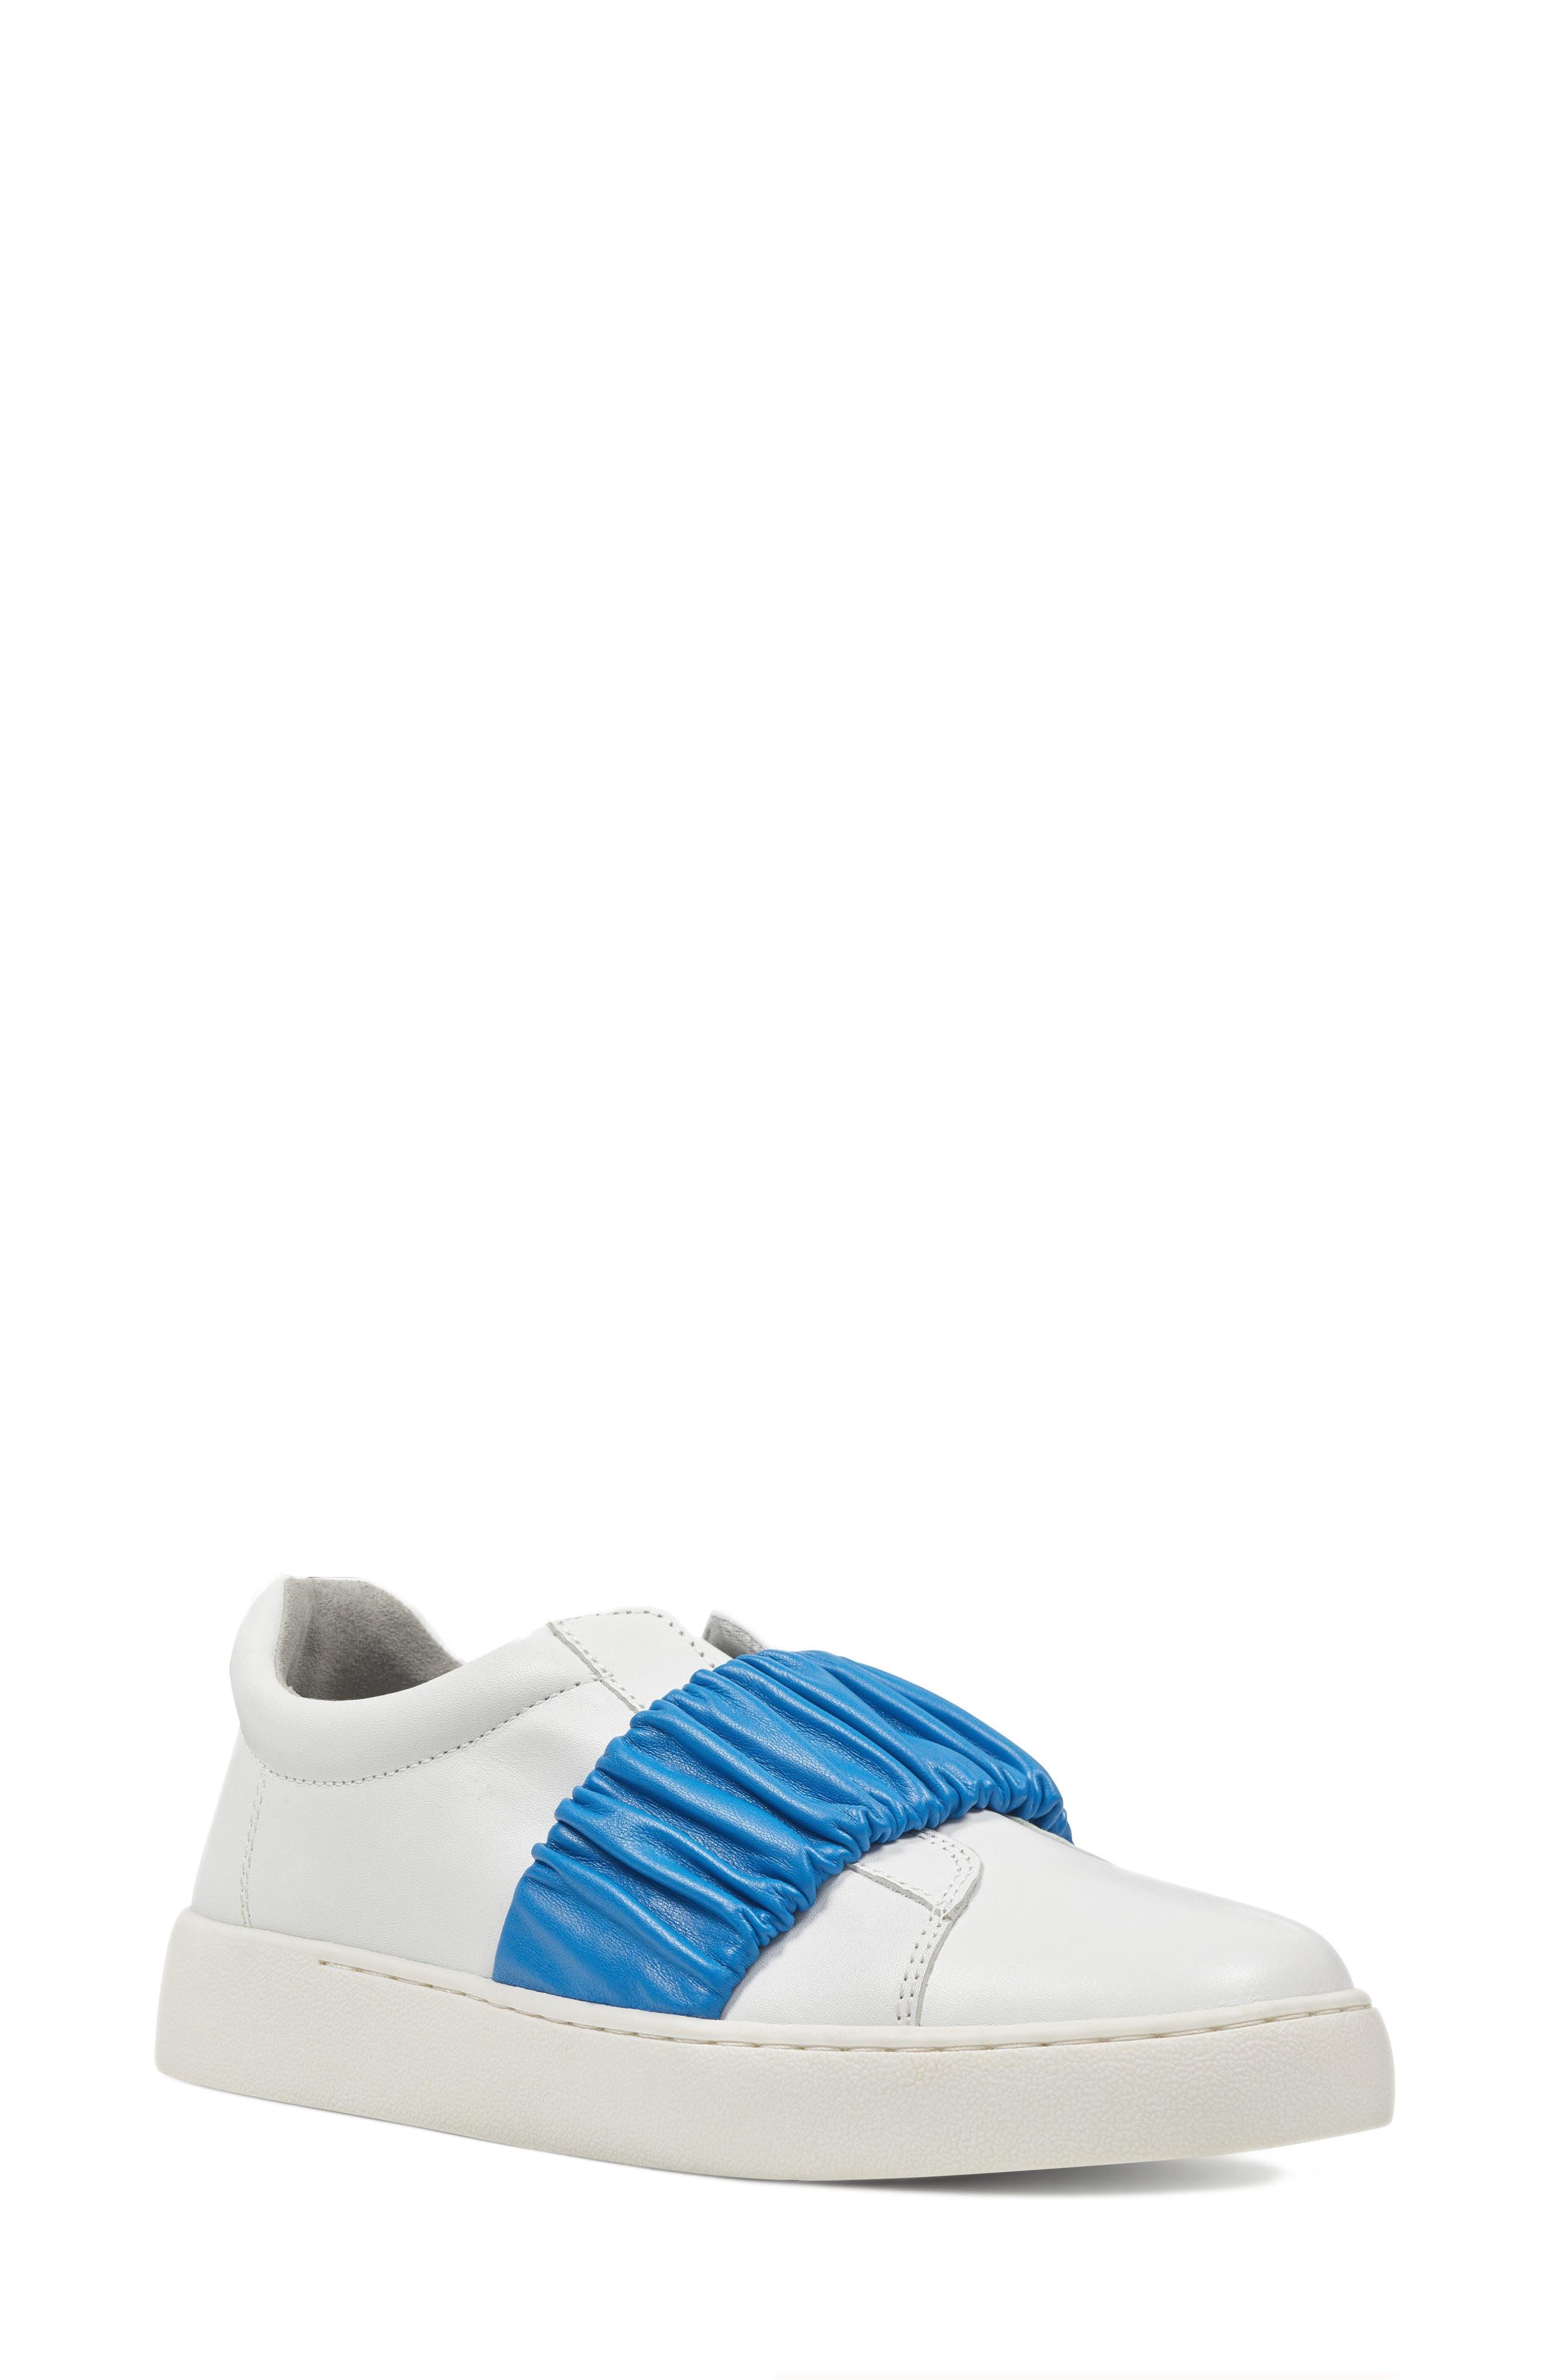 Pindiviah Slip-On Sneaker,                             Main thumbnail 1, color,                             100